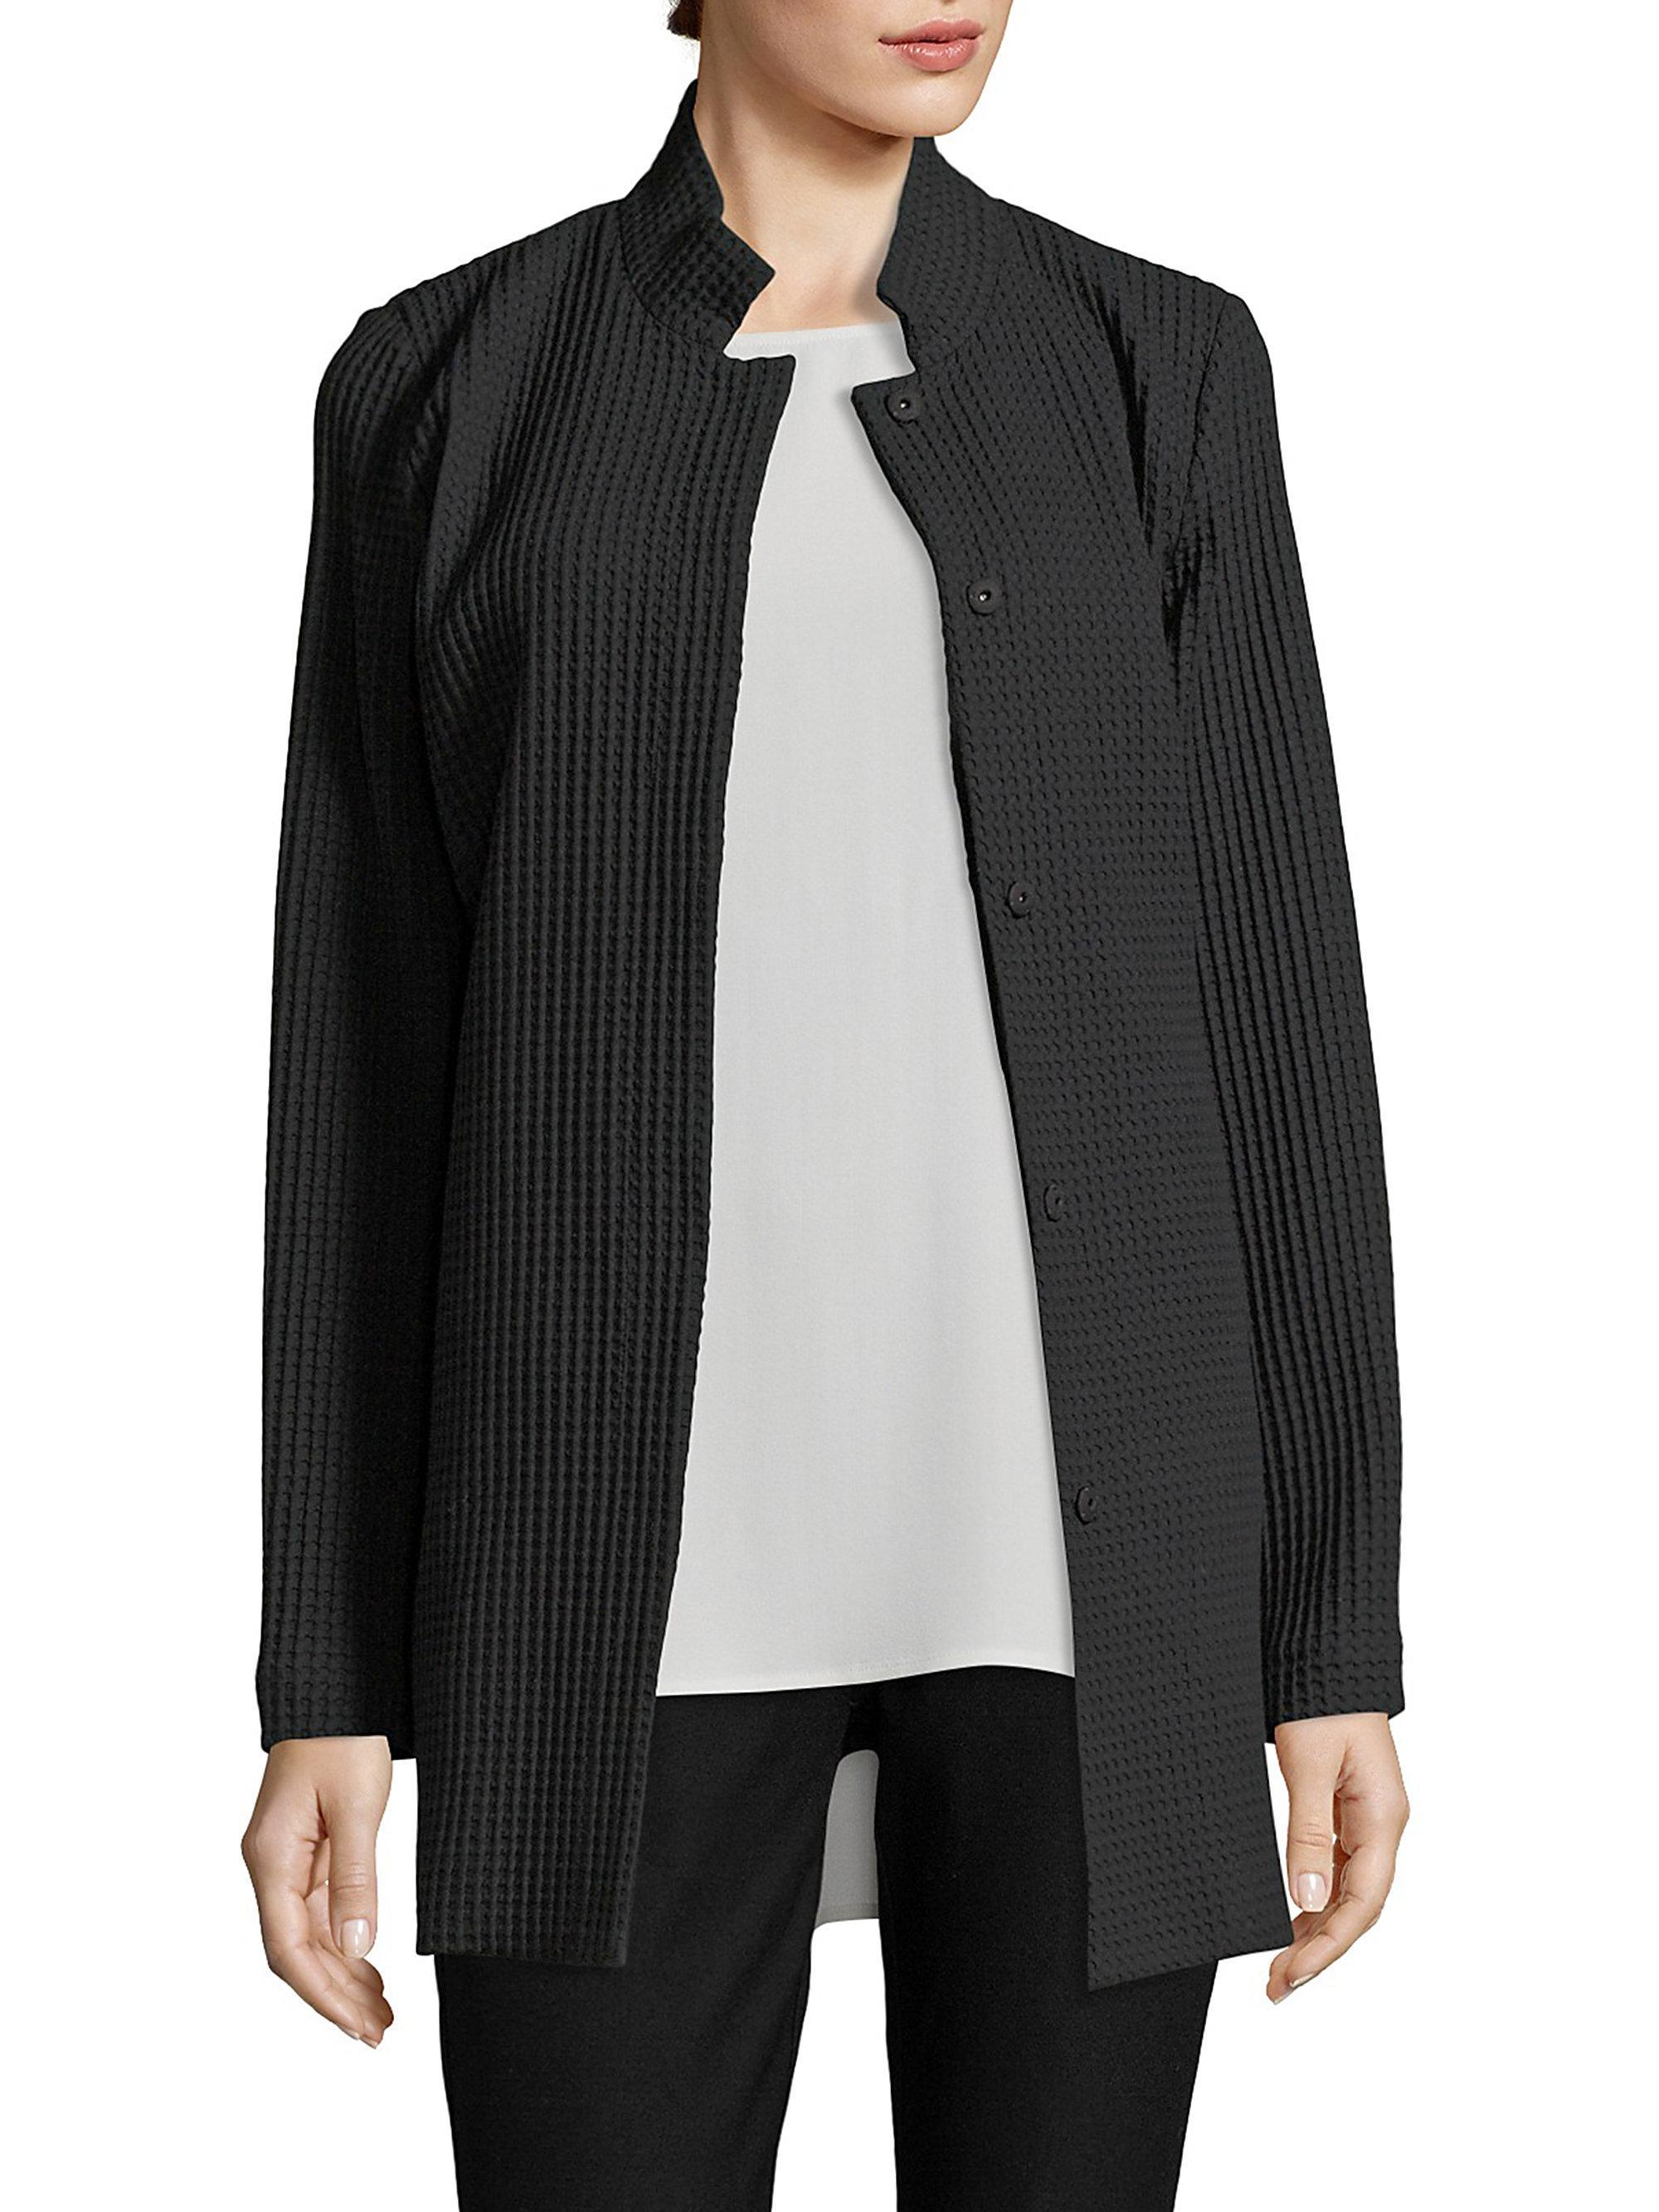 Lyst Eileen Fisher Textured Stand Collar Jacket In Black